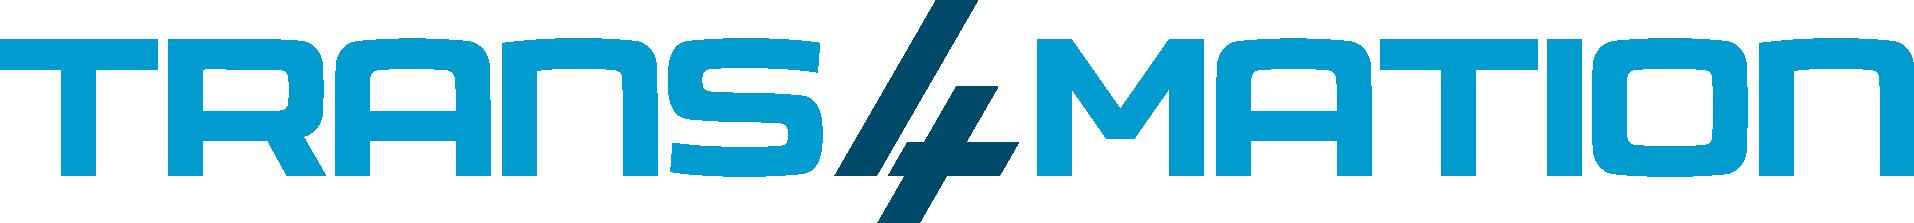 trans4mation - Logo